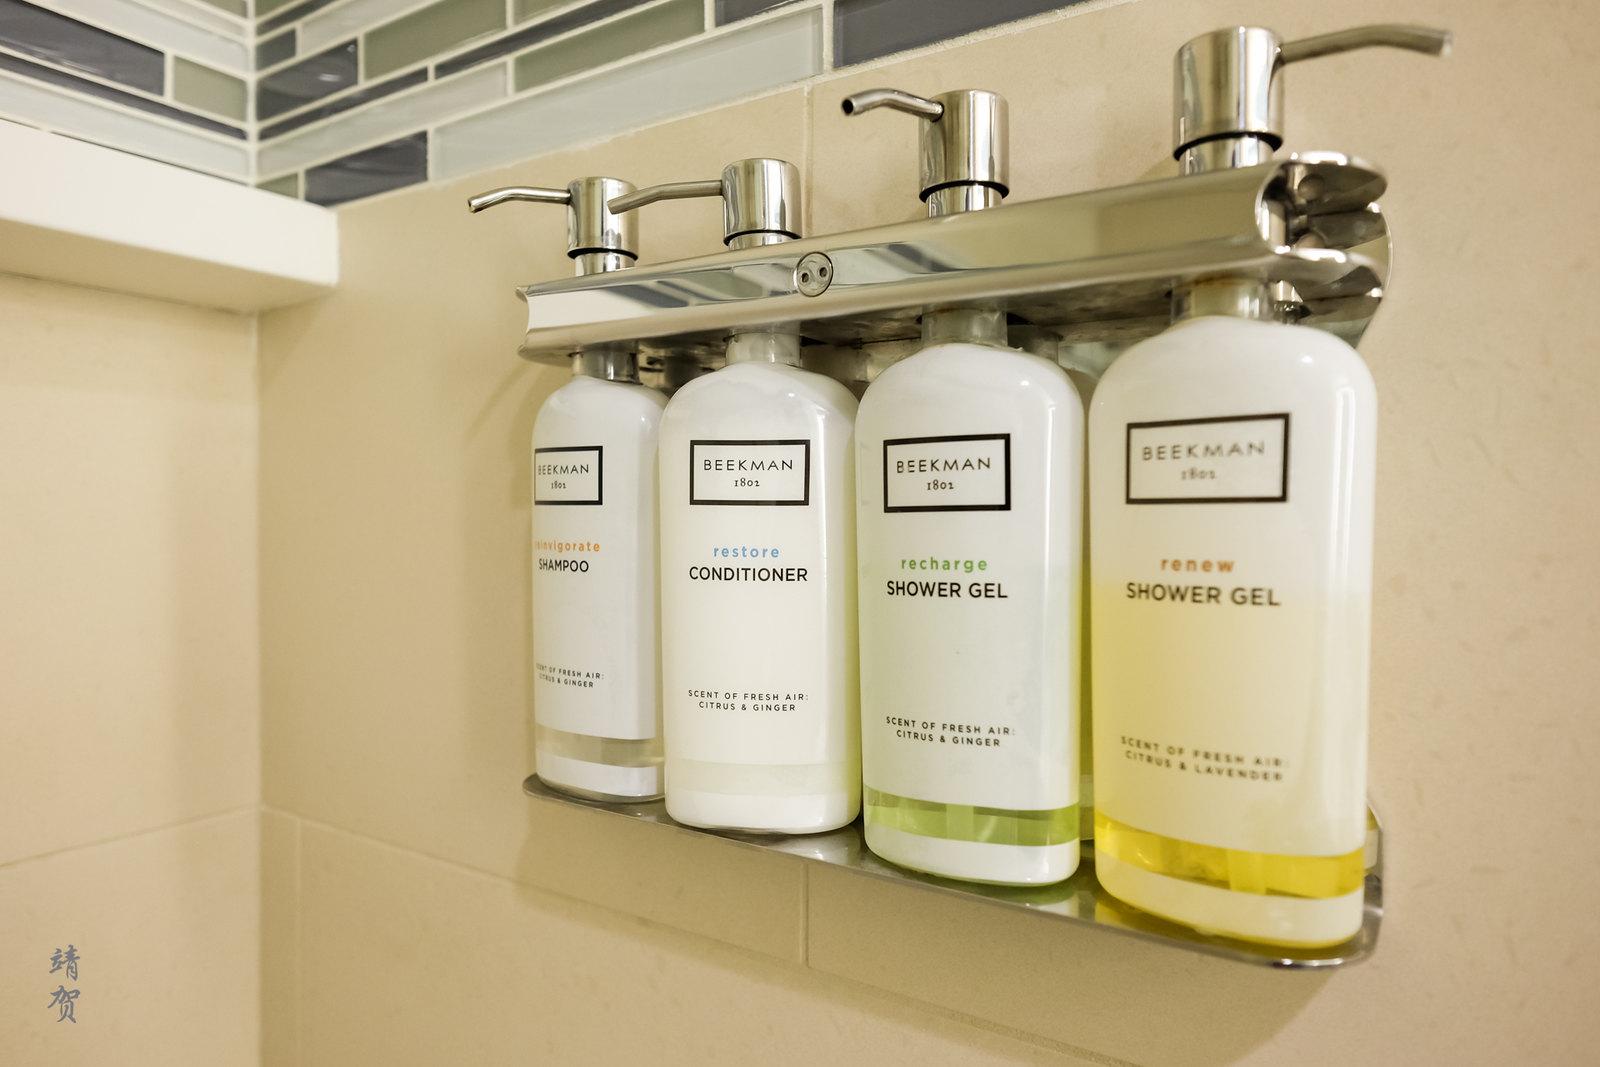 Wall mounted bath amenities